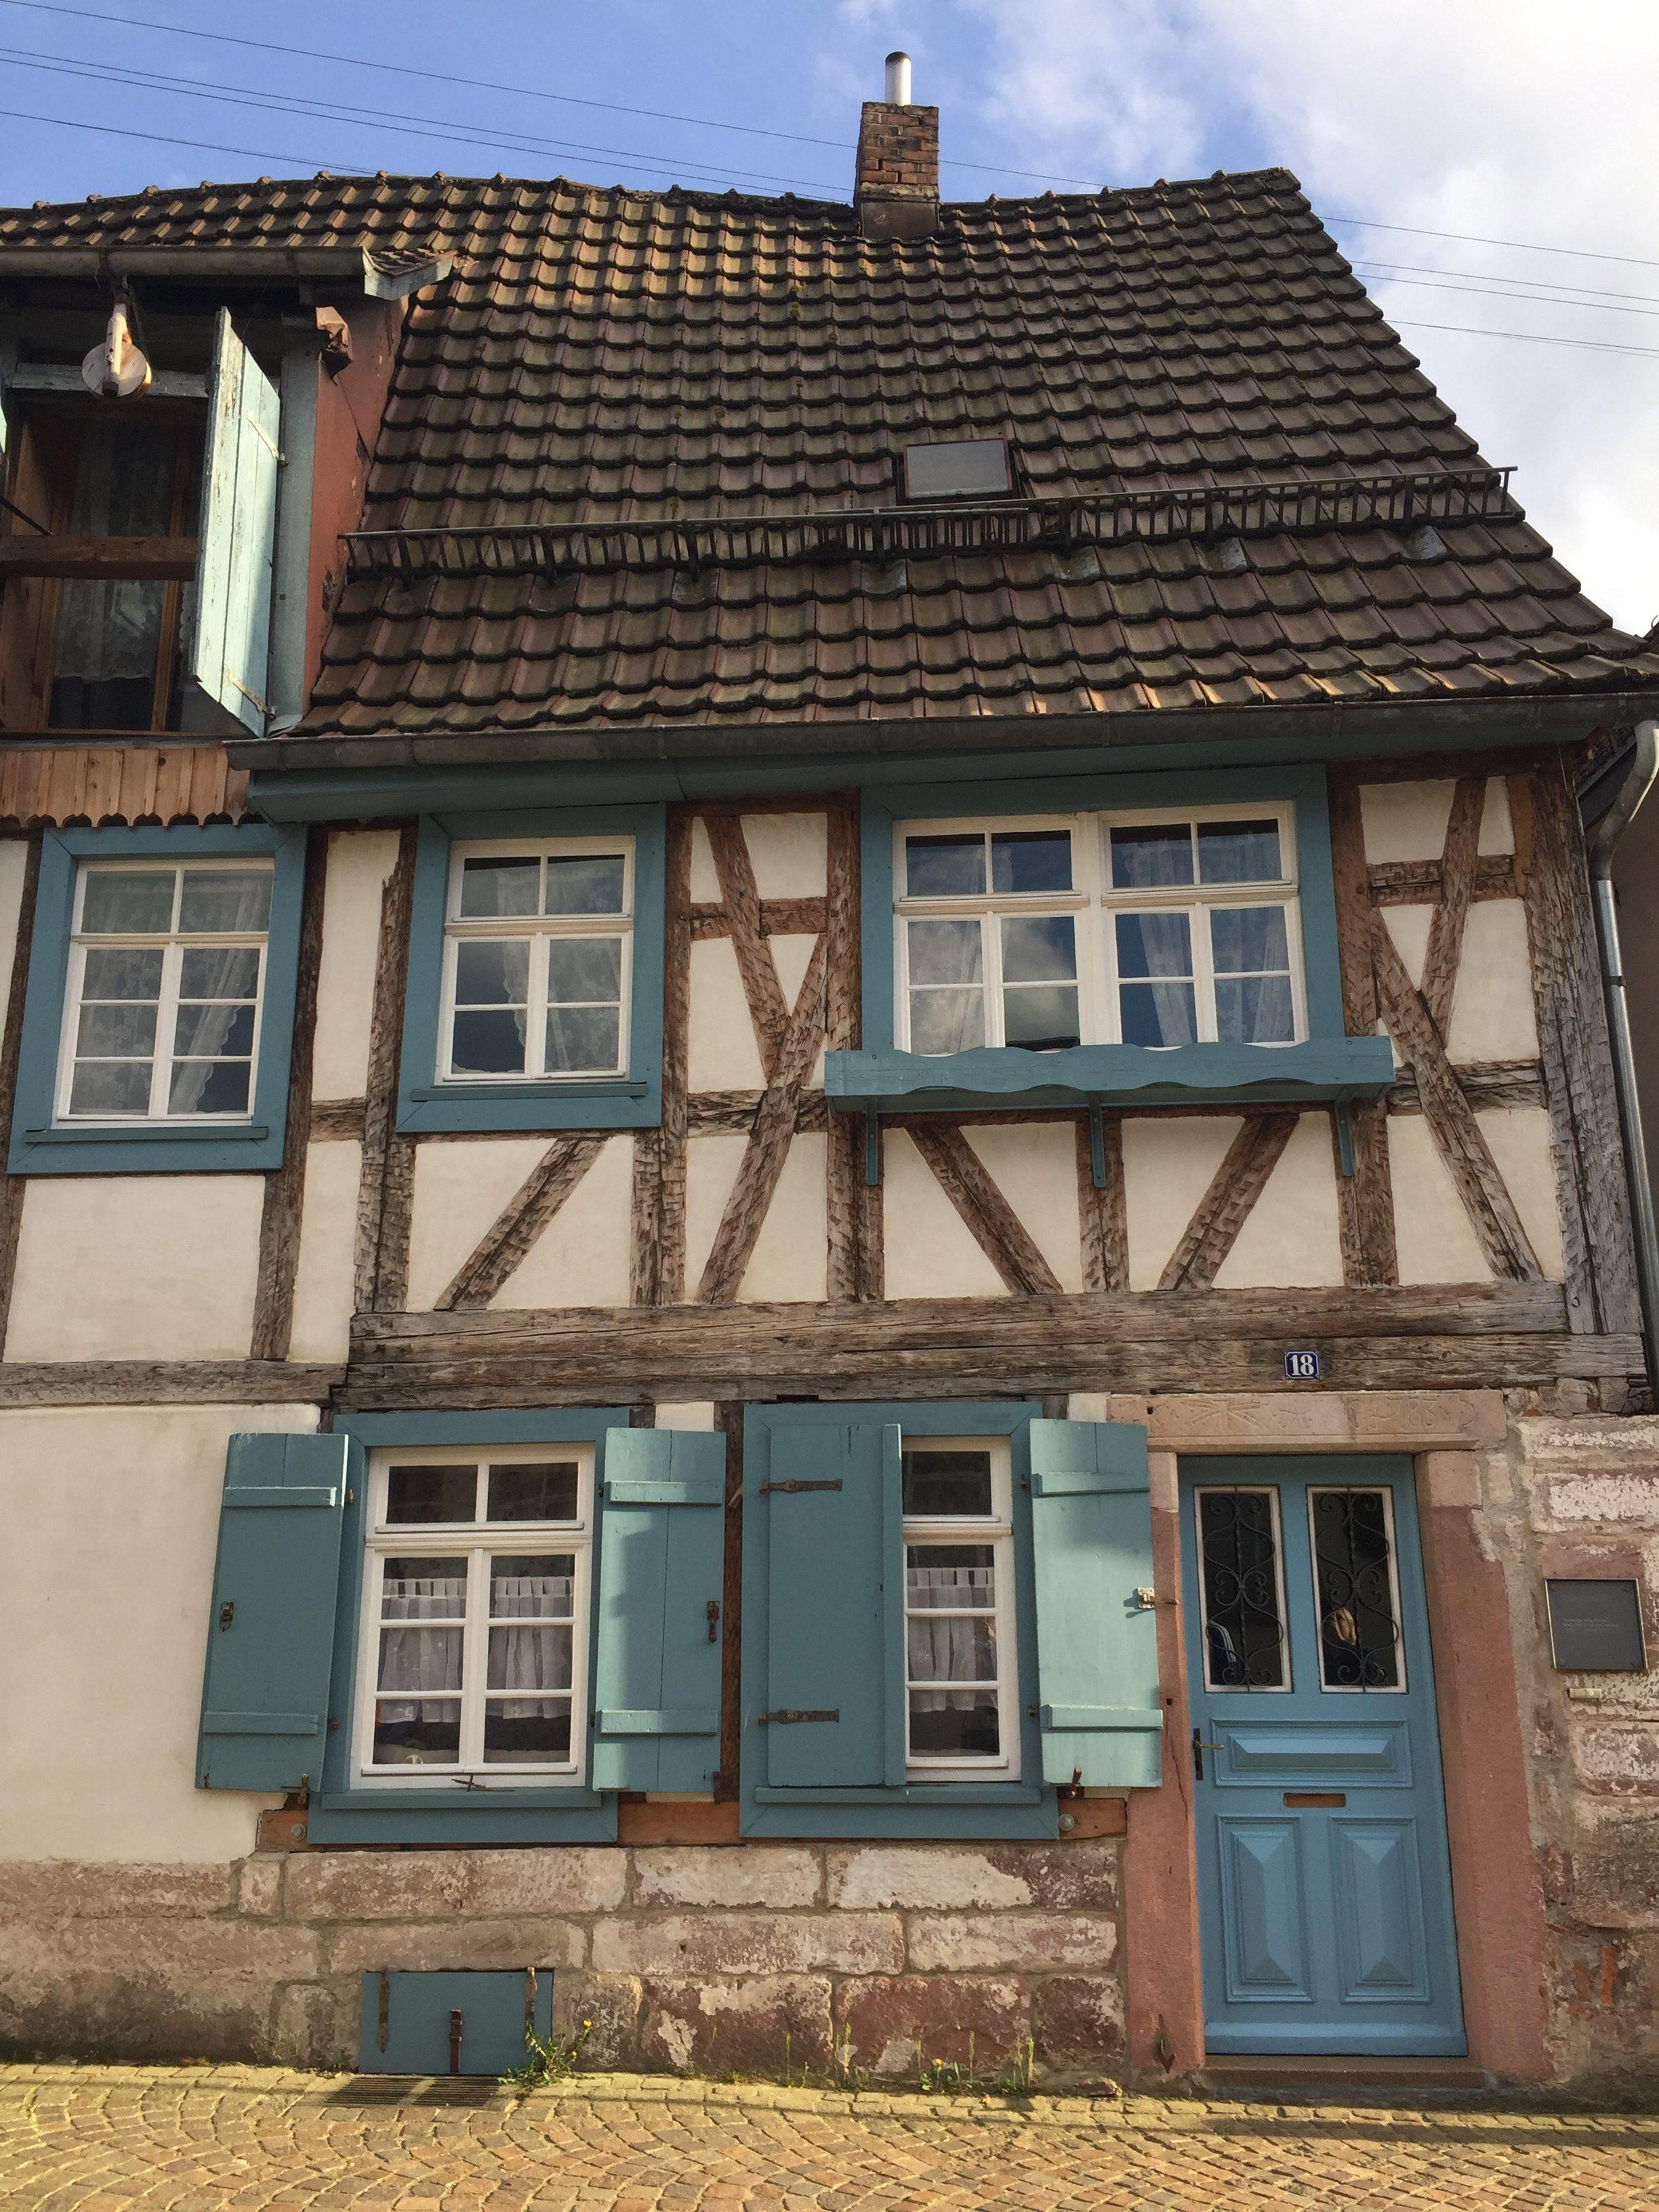 Traumferienhaus Schwarzwald Historisches Gerberhaus Wellness Mehr